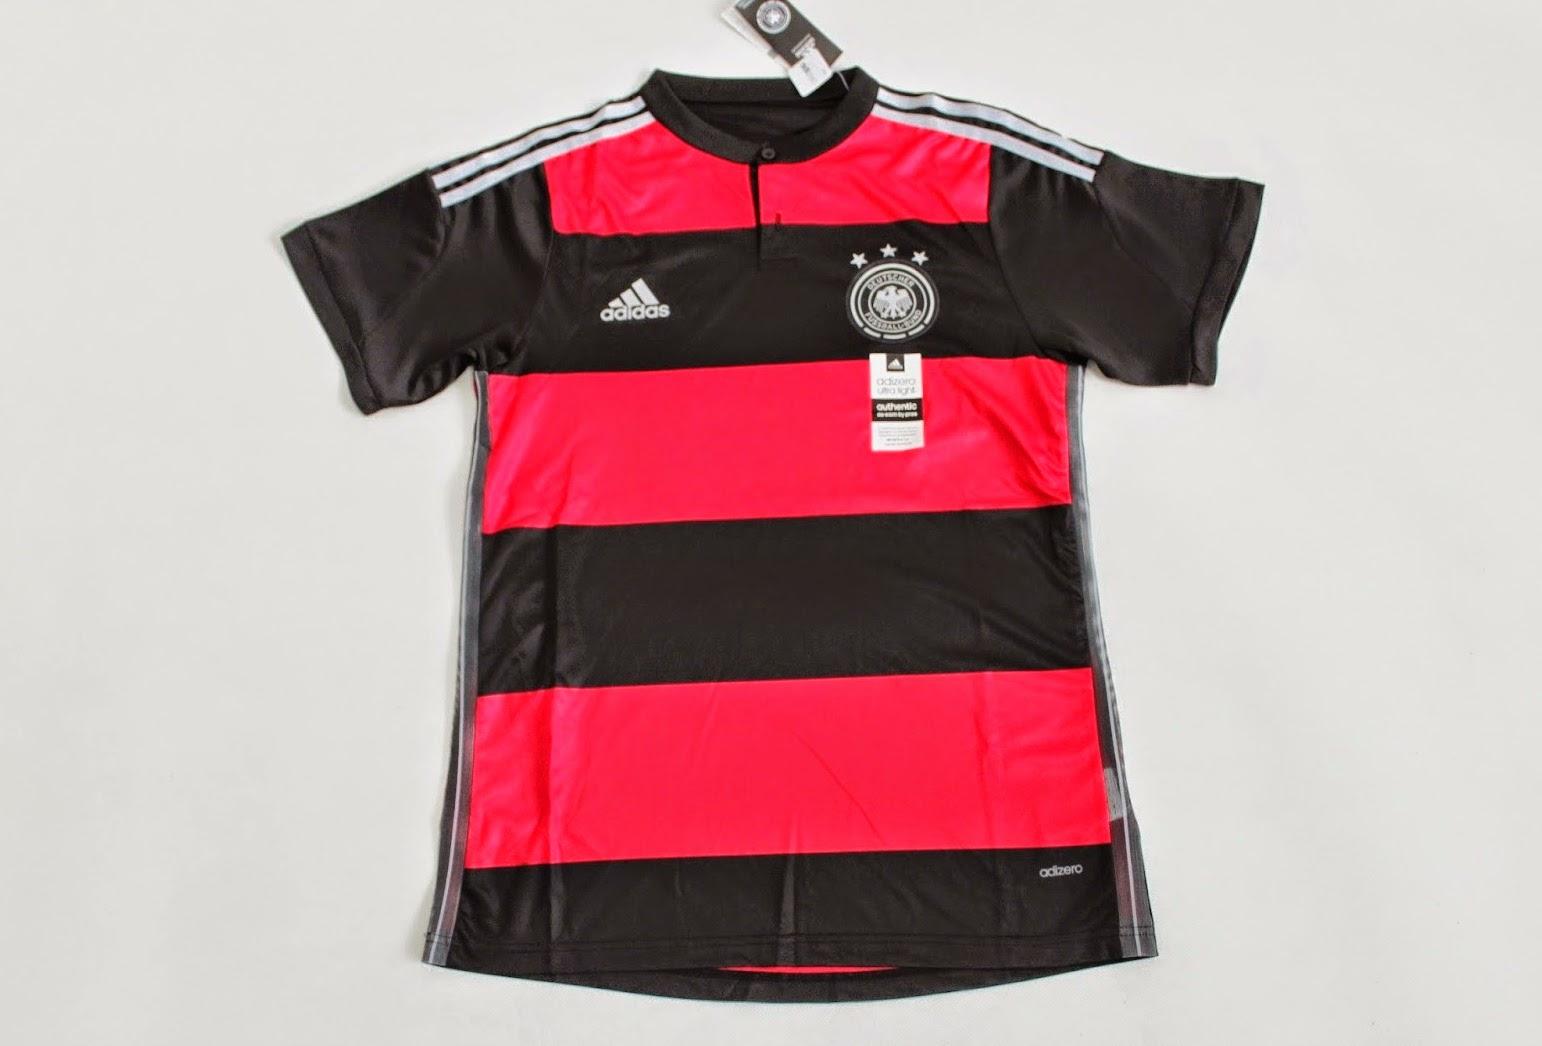 Baju dan Kaos Couple - Grosir dan Eceran Baju Pasangan Sepak Bola Piala Dunia Germany Away